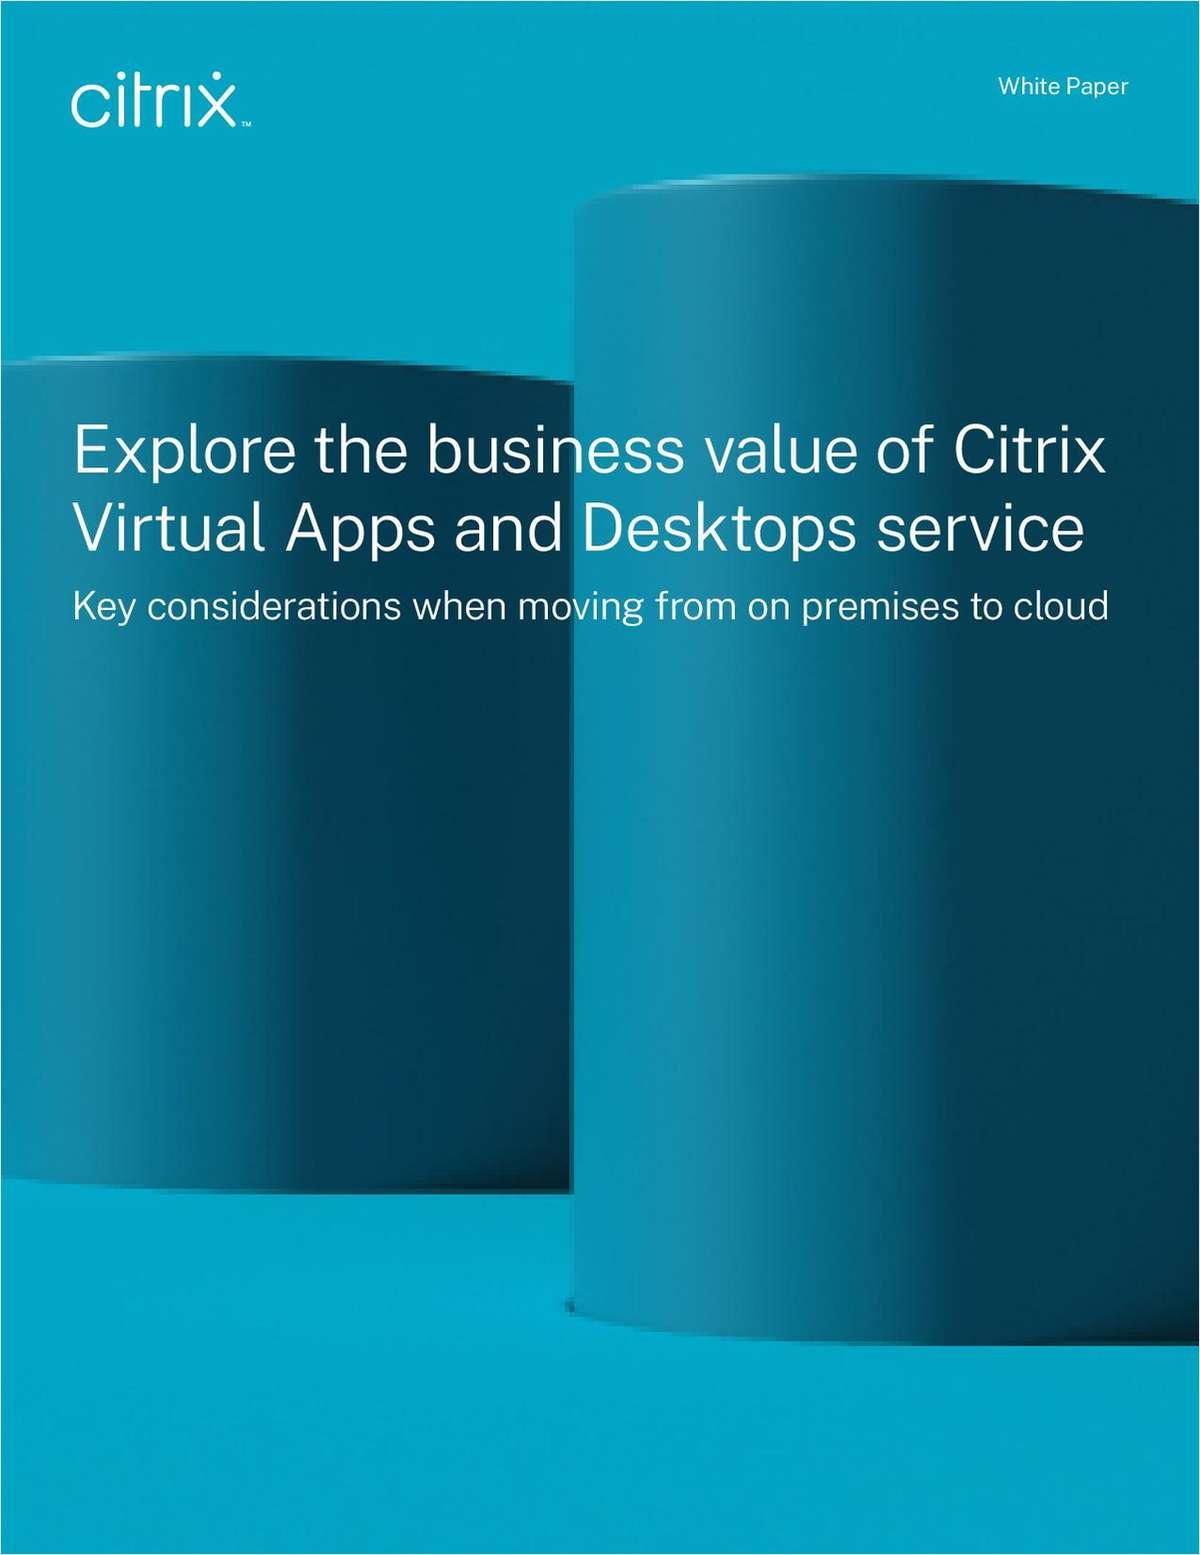 Explore the business value of Citrix Virtual Apps and Desktops service White Paper